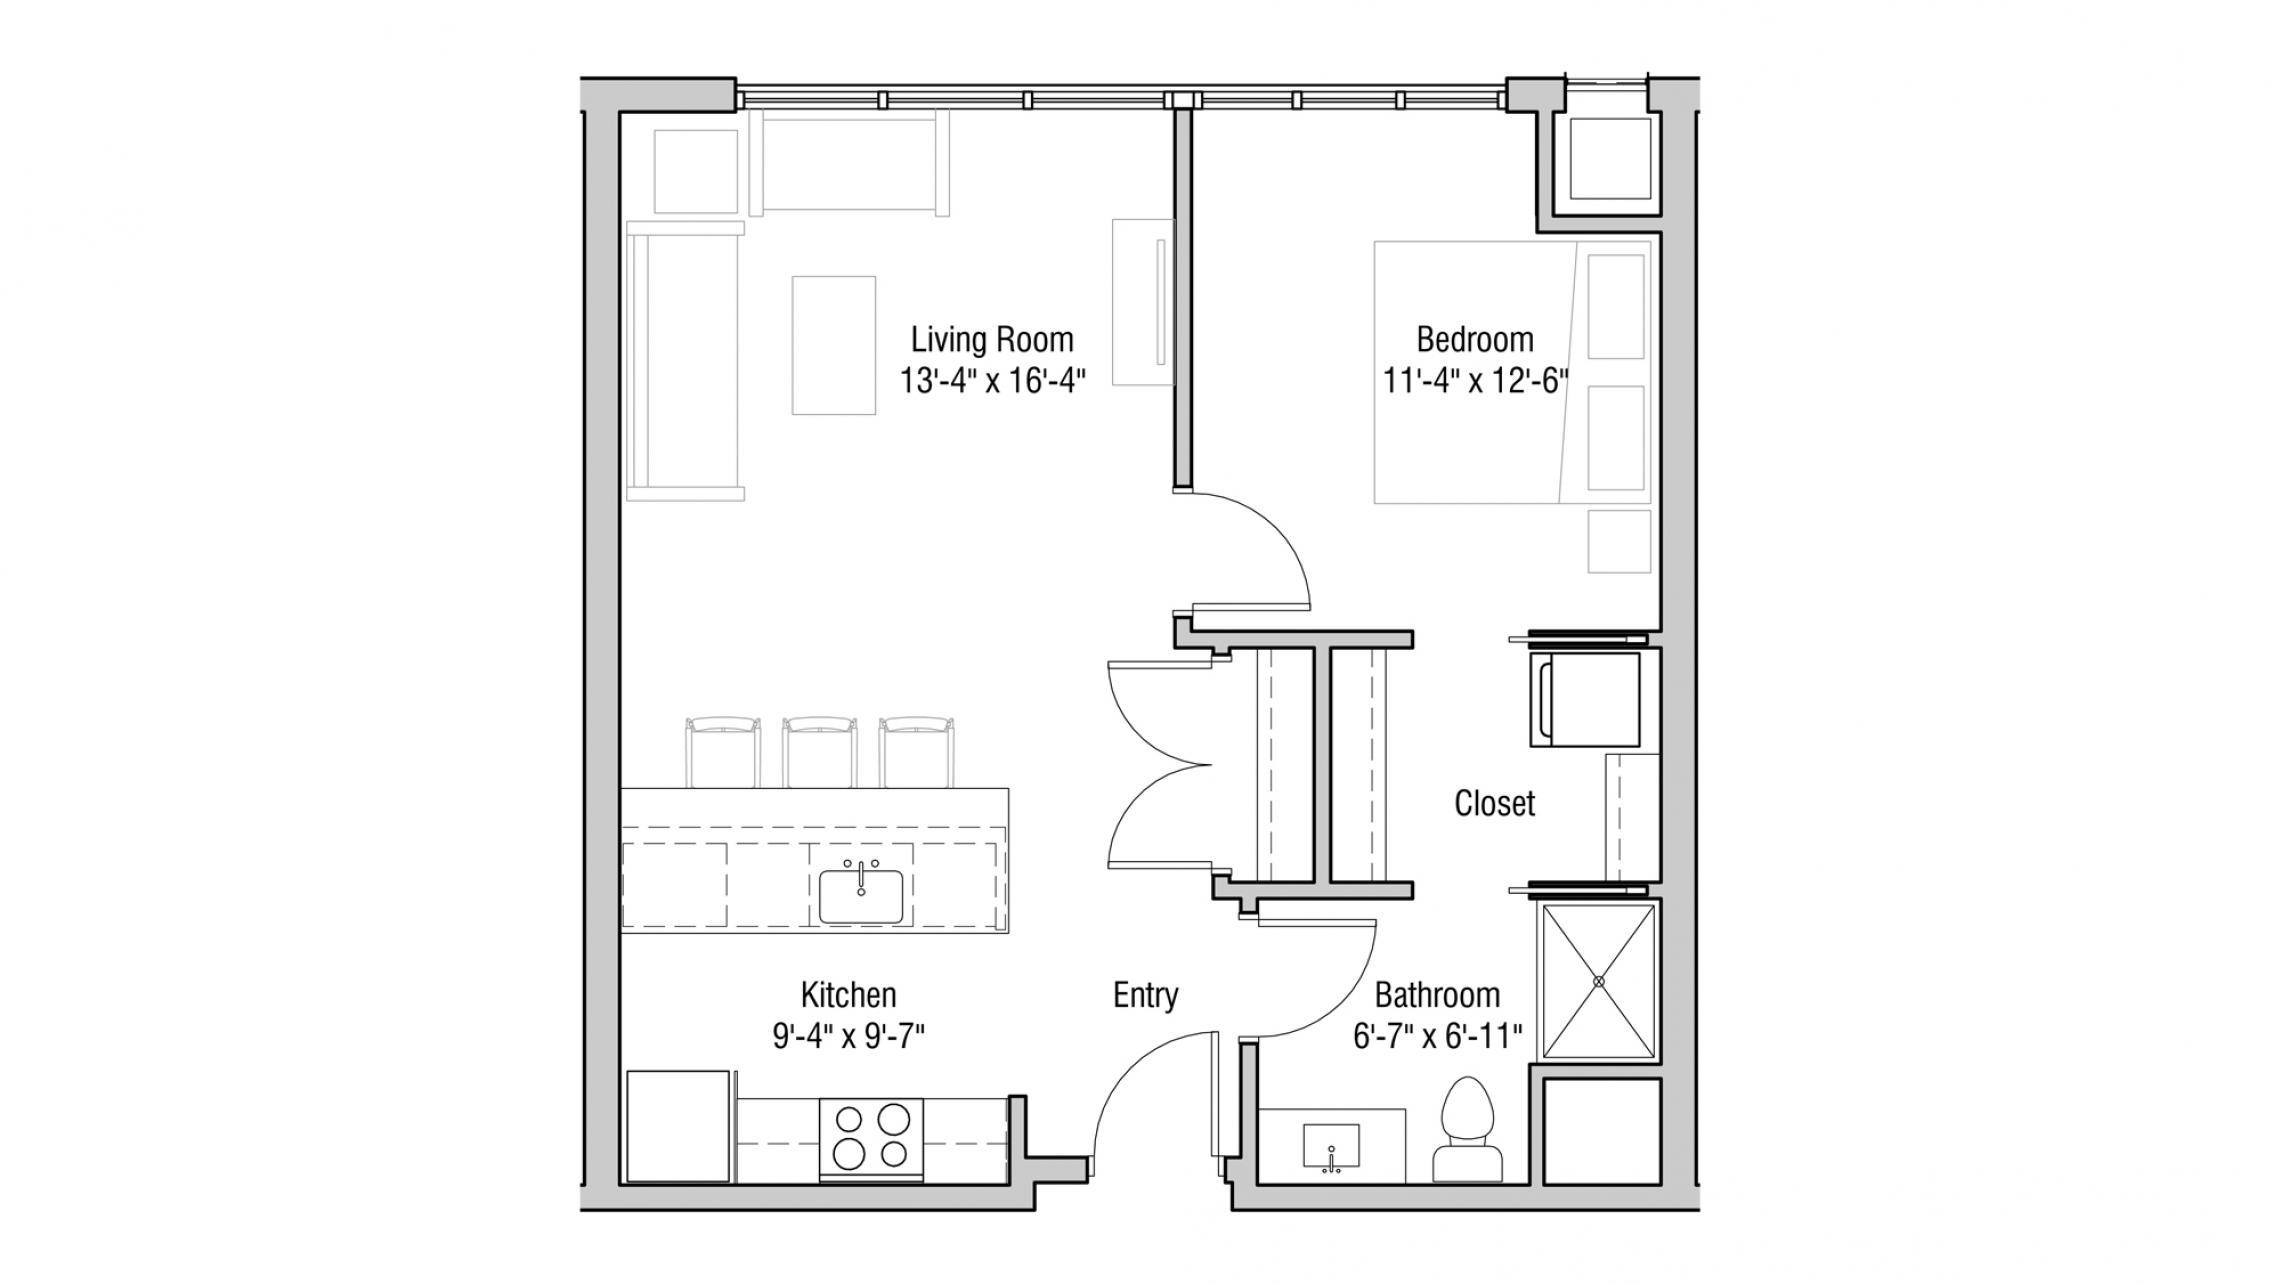 ULI Quarter Row 319 - One Bedroom, One Bathroom